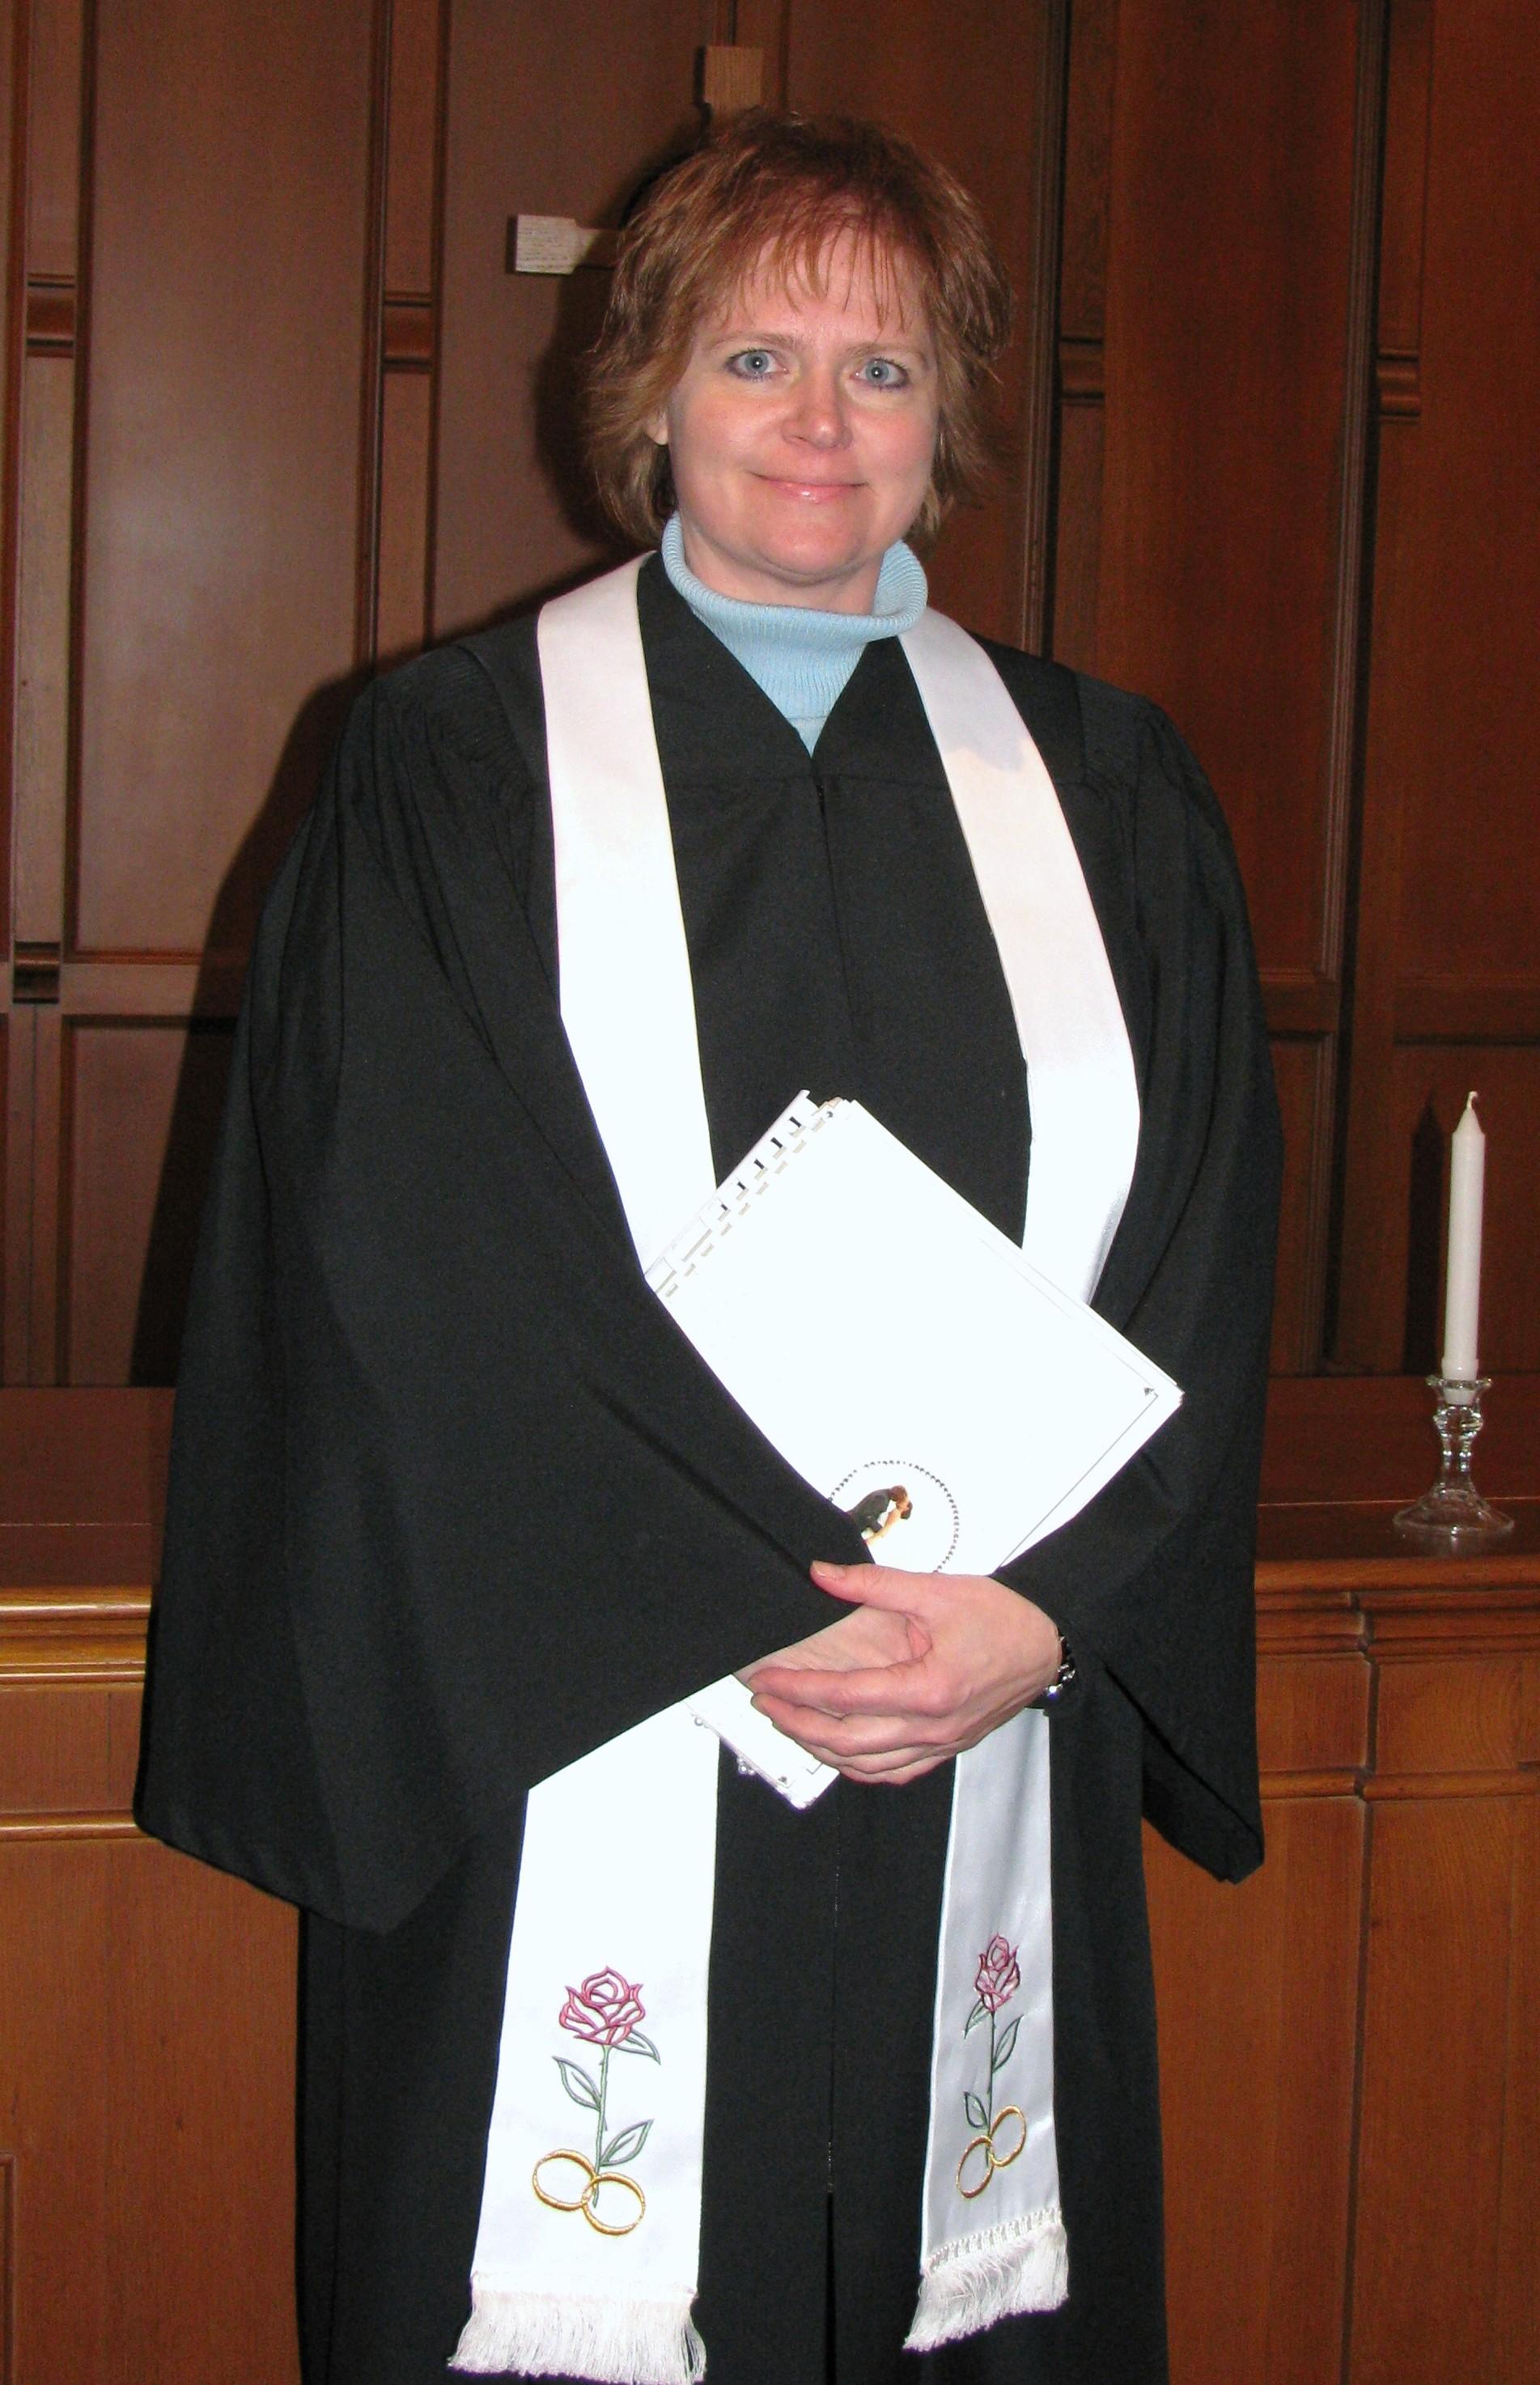 Rev. Renee officiates in Pulaski, Green Bay, Shawano, Clintonville and surrounding areas.